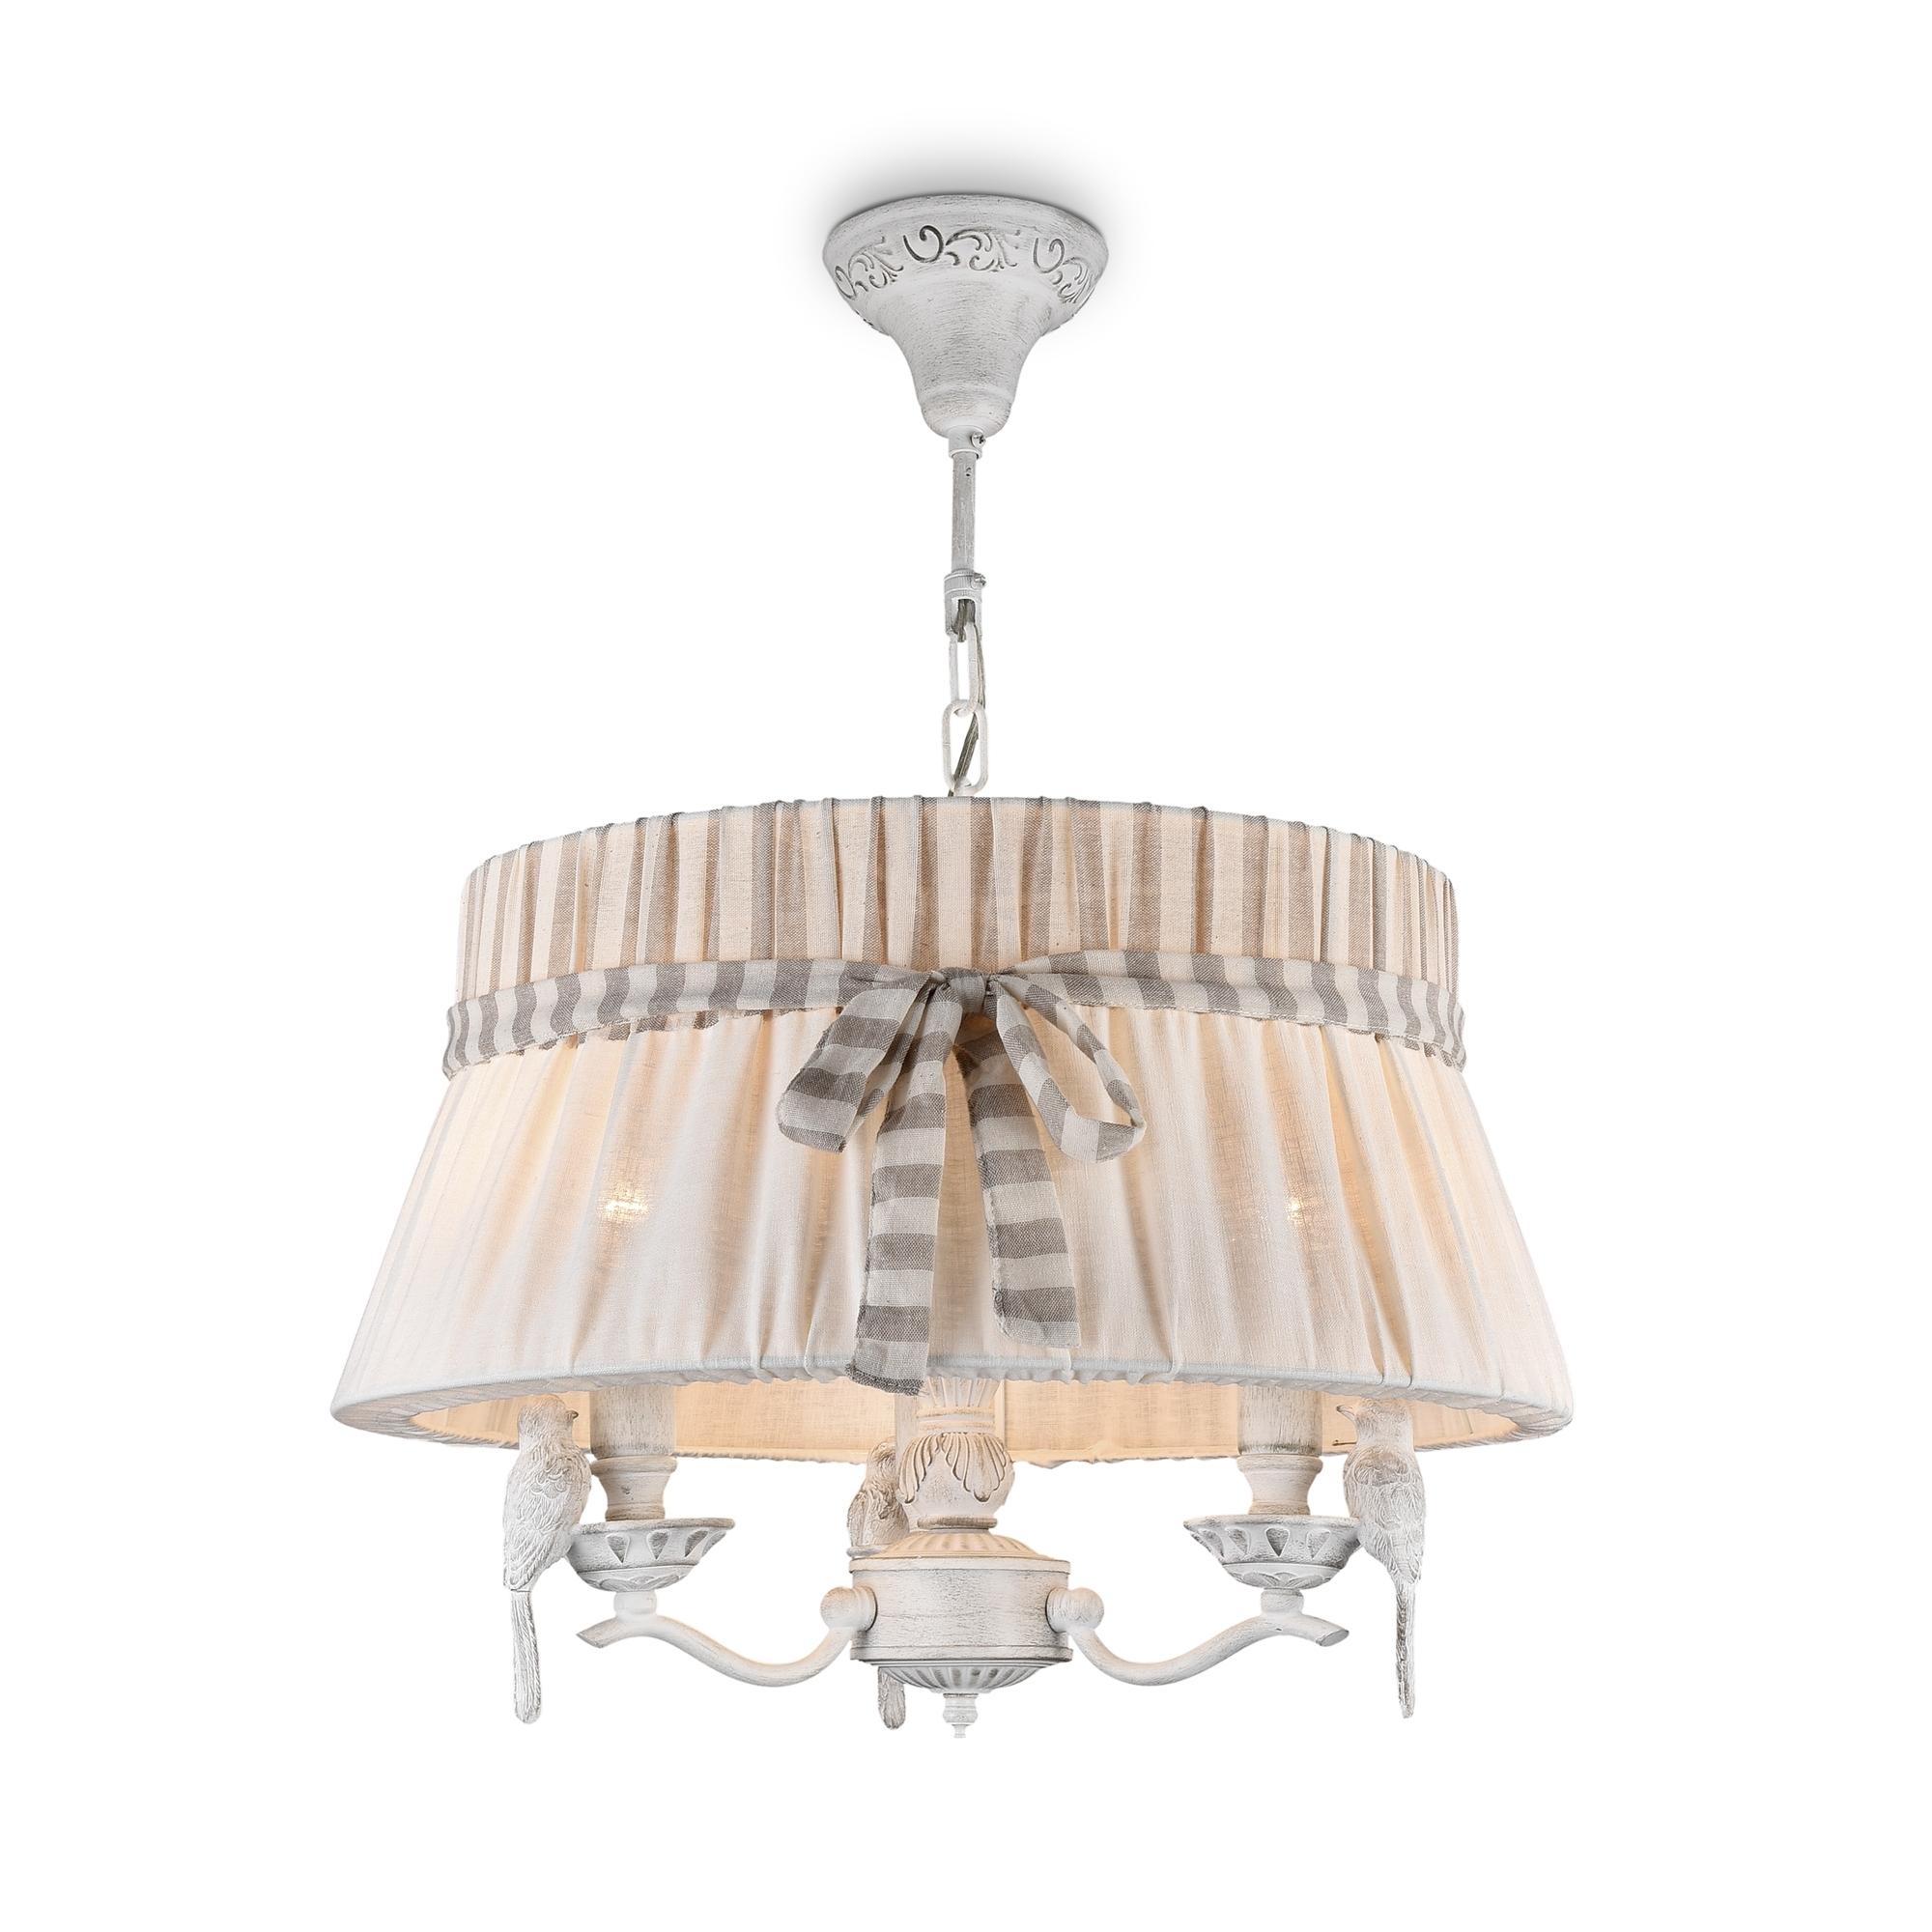 Подвесная люстра Maytoni Bird ARM013-33-W, 3xE14x40W, белый, бежевый, серый, металл, пластик, текстиль - фото 1